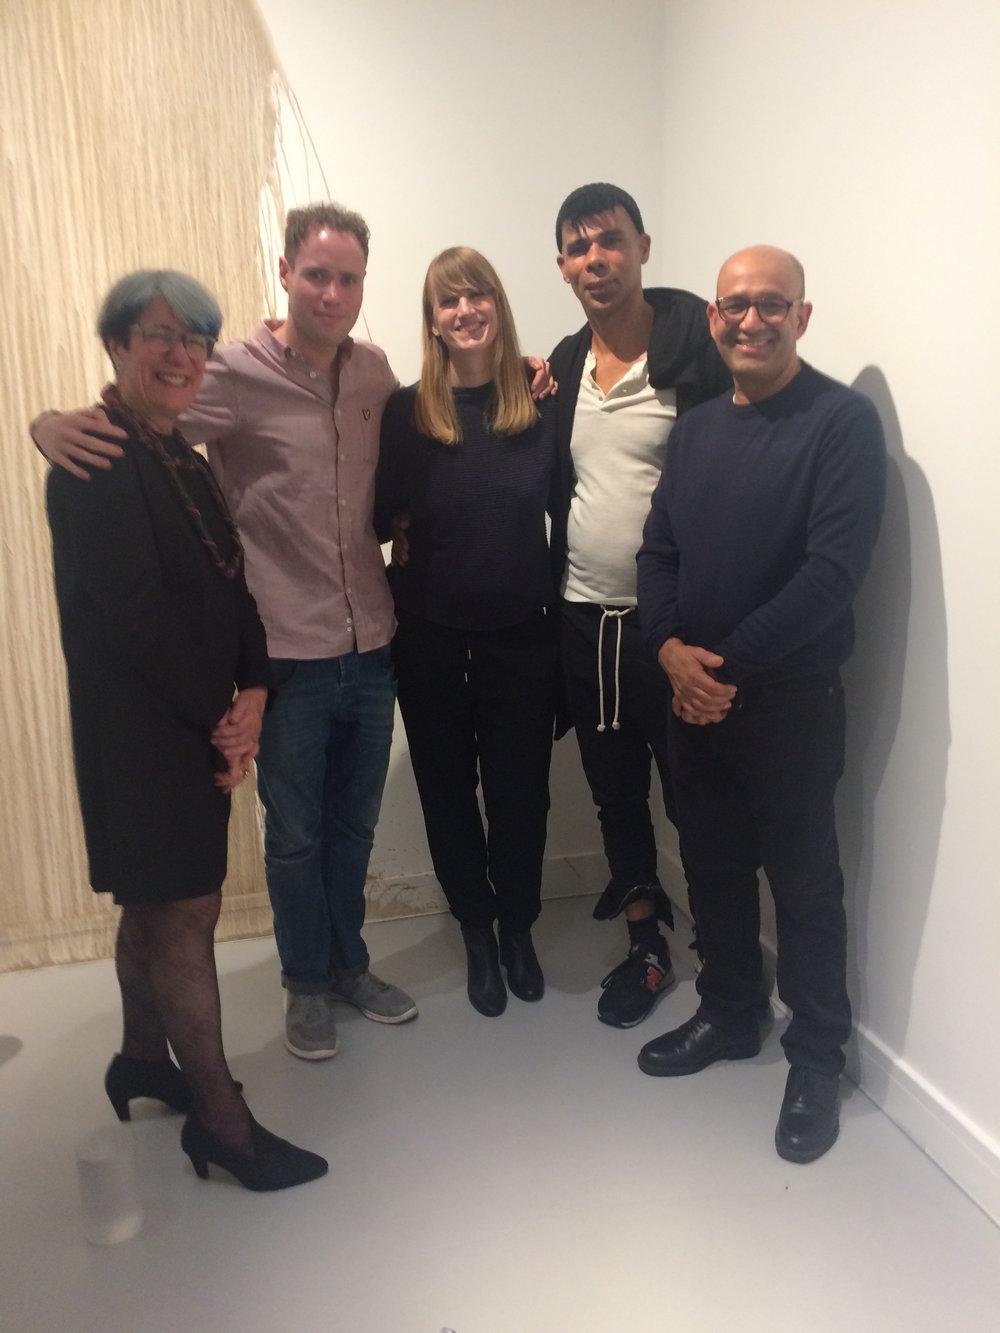 Opening night, left to right, Veronica Sekules, Shaun Fraser, Flora Bowden, Wayne Binitie, Kabir Hussain